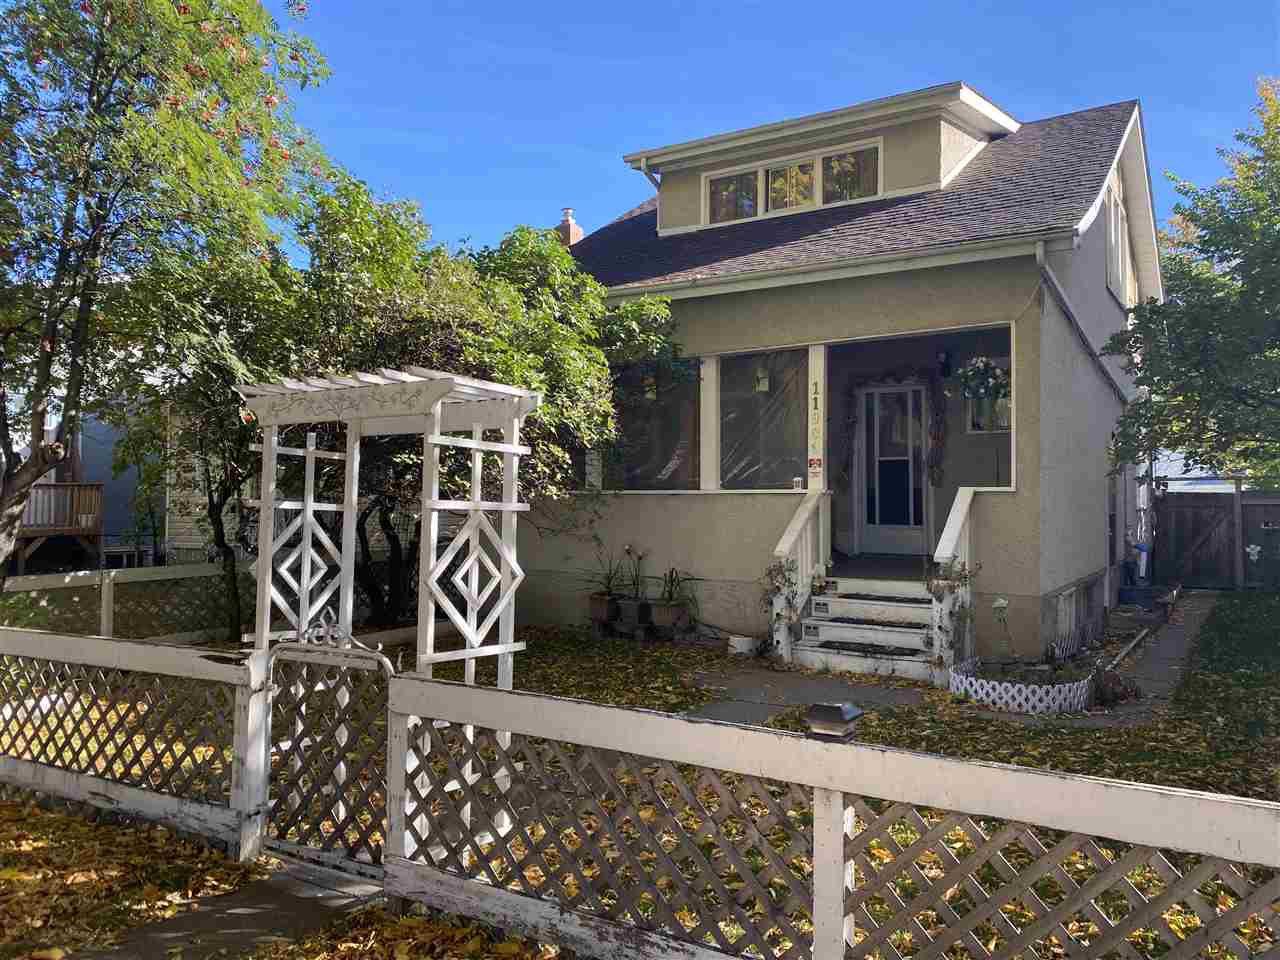 Main Photo: 11909 91 Street in Edmonton: Zone 05 House for sale : MLS®# E4216230